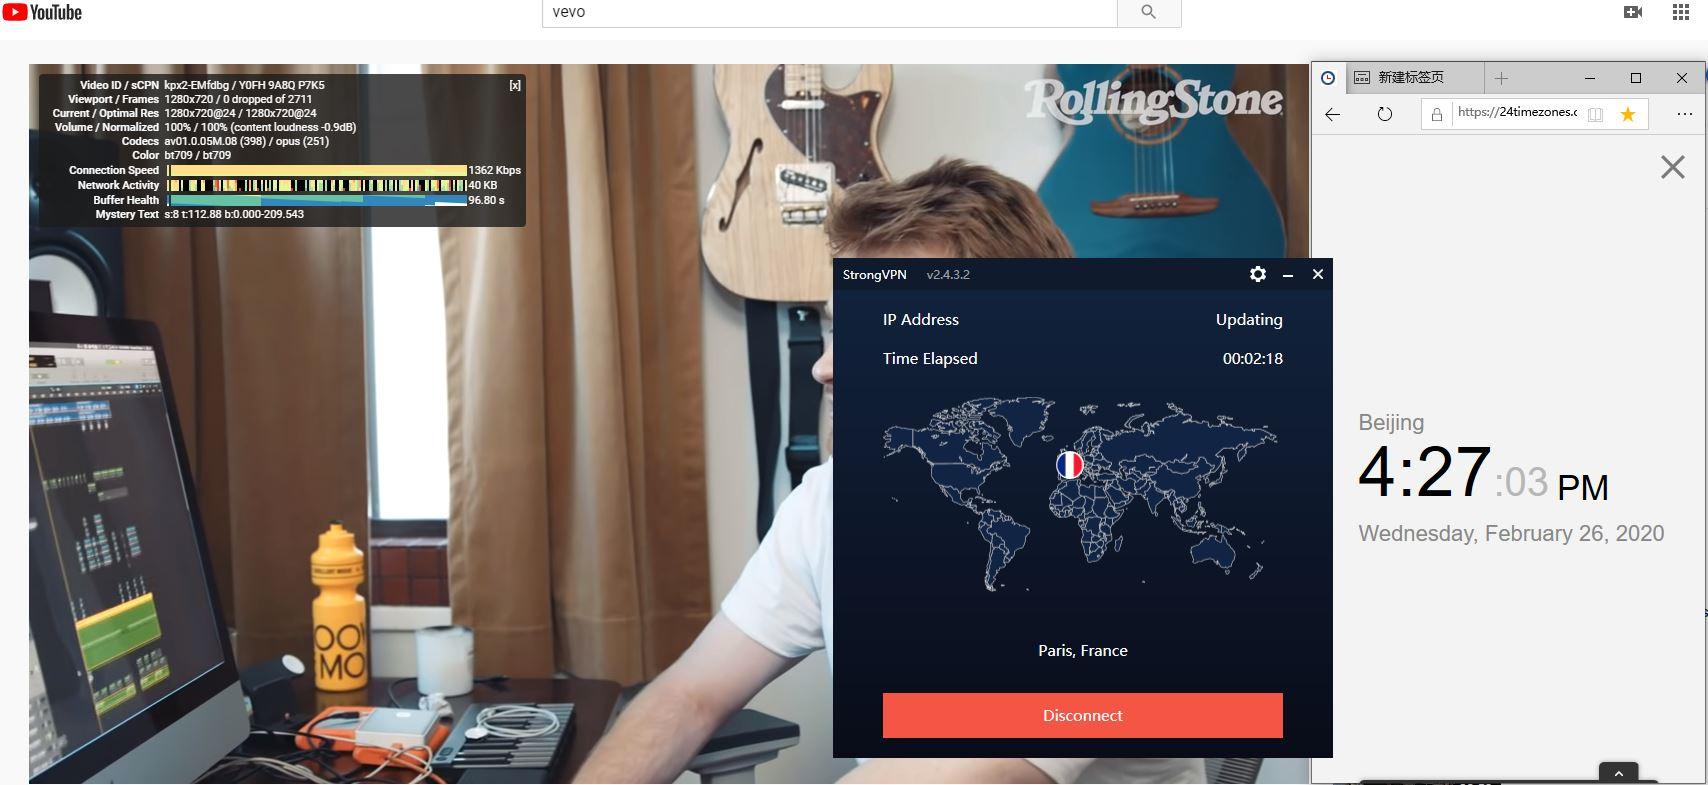 StrongVPN Windows10 Paris France 中国VPN翻墙 科学上网 Youtube测速-20200226